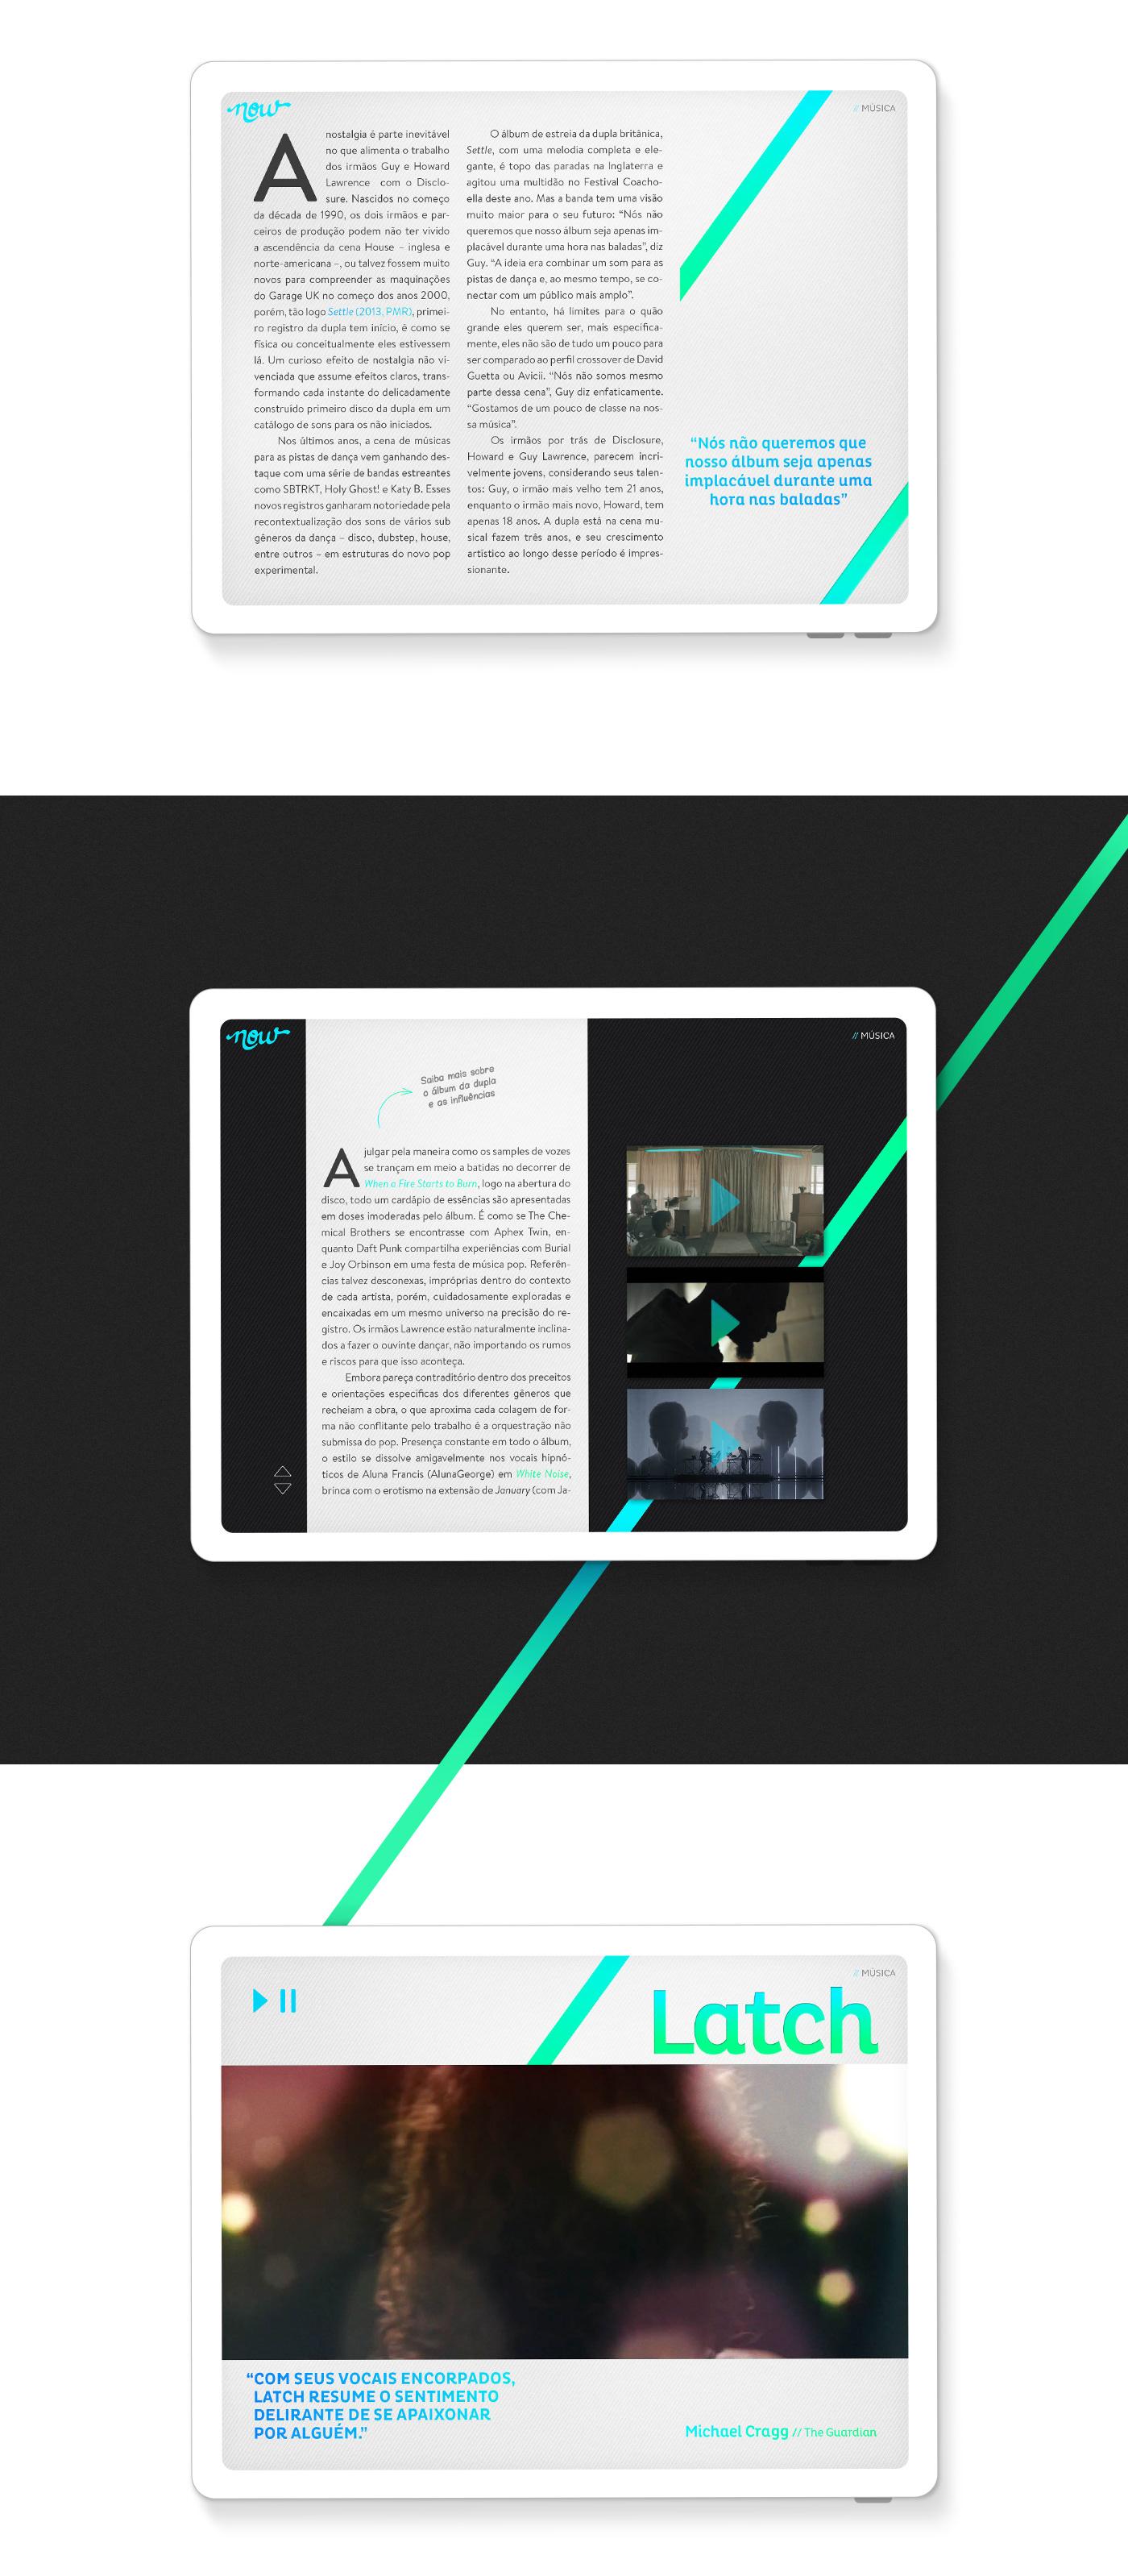 magazine Movies disclosure Frances Ha news now iPad digital interact ebook